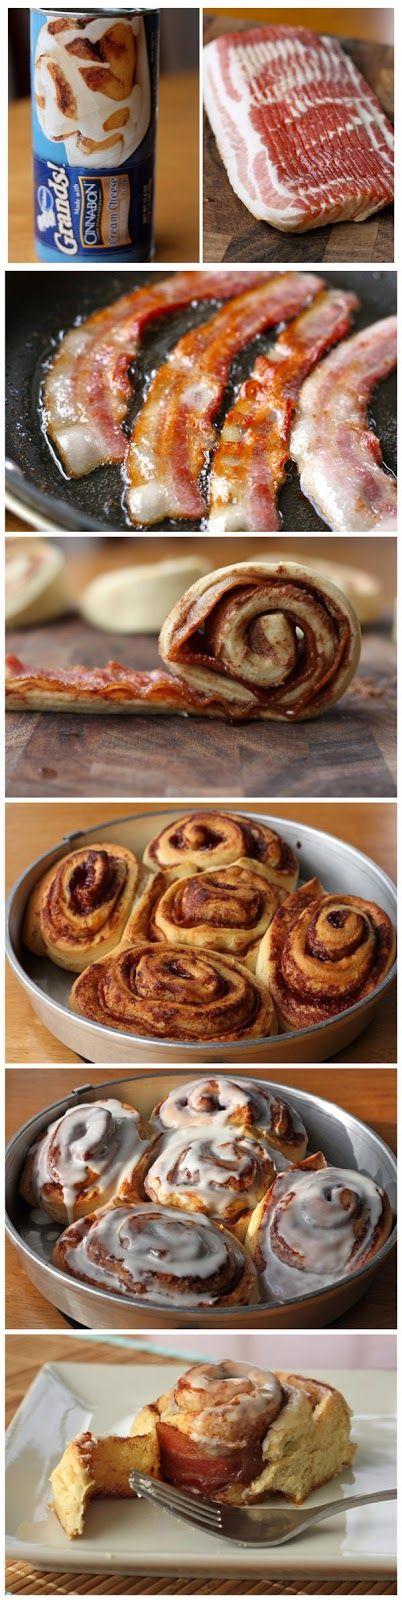 /Bacon cinnamon rolls...